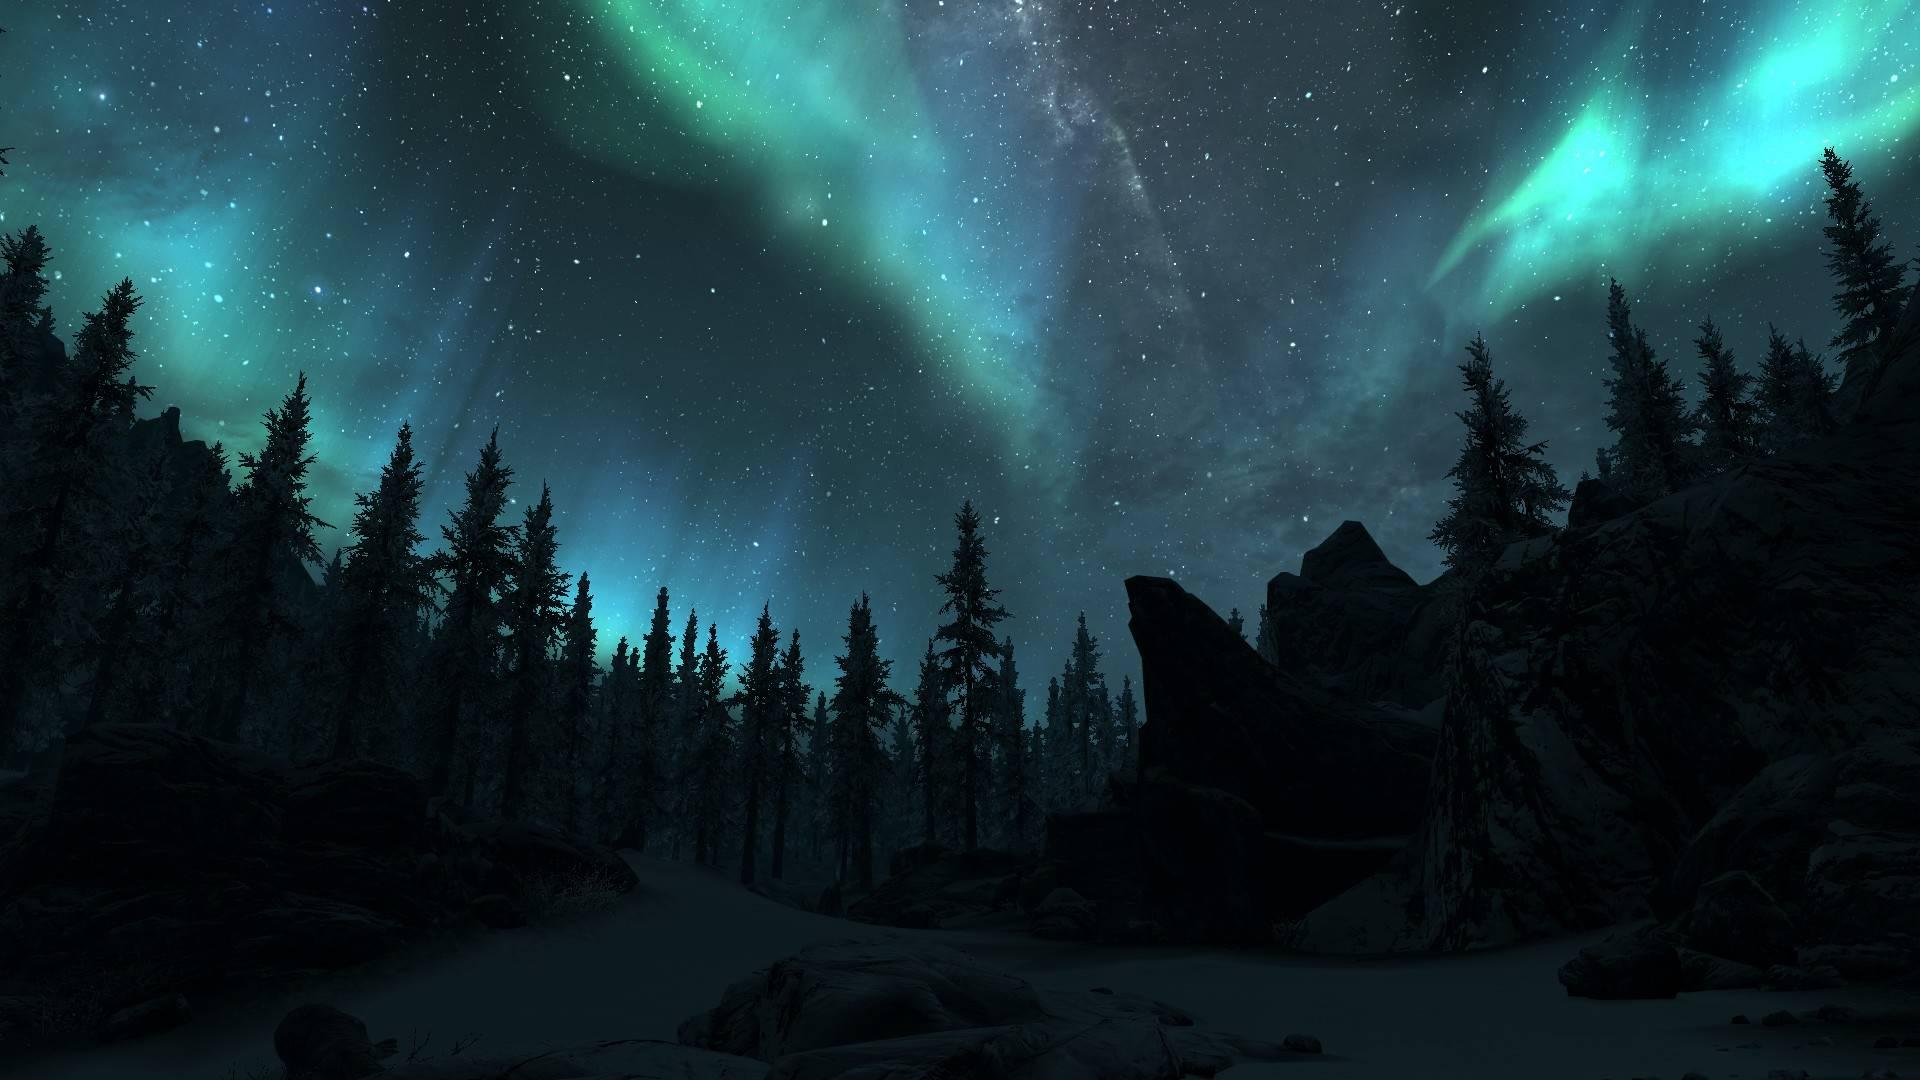 HD Northern Lights Wallpaper - WallpaperSafari